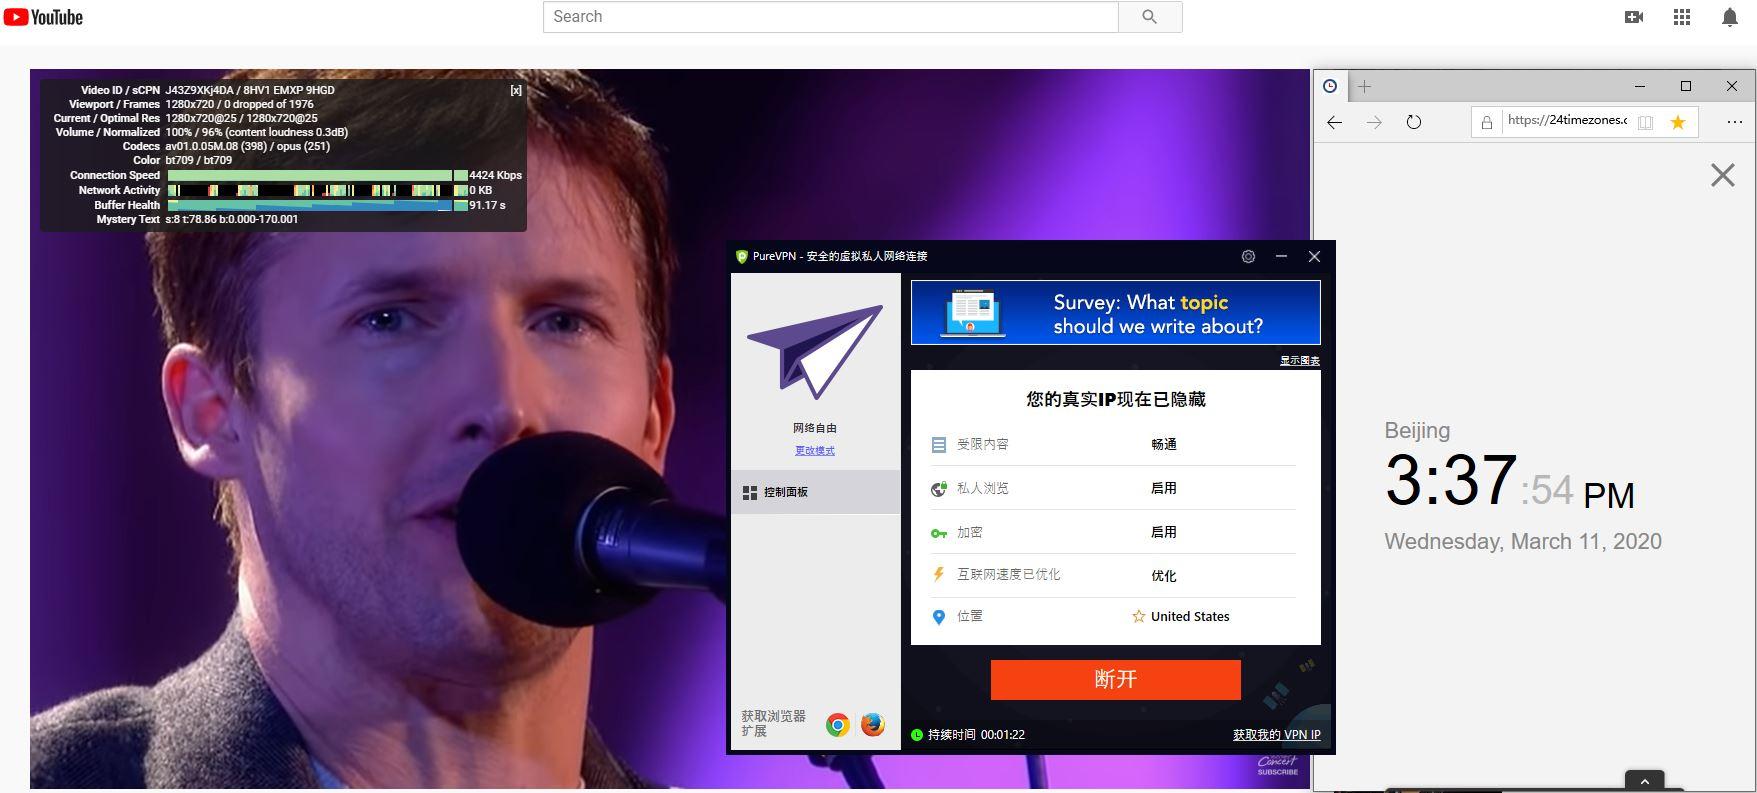 Windows10 PureVPN USA 中国VPN翻墙 科学上网 SpeedTest测速 - 20200311